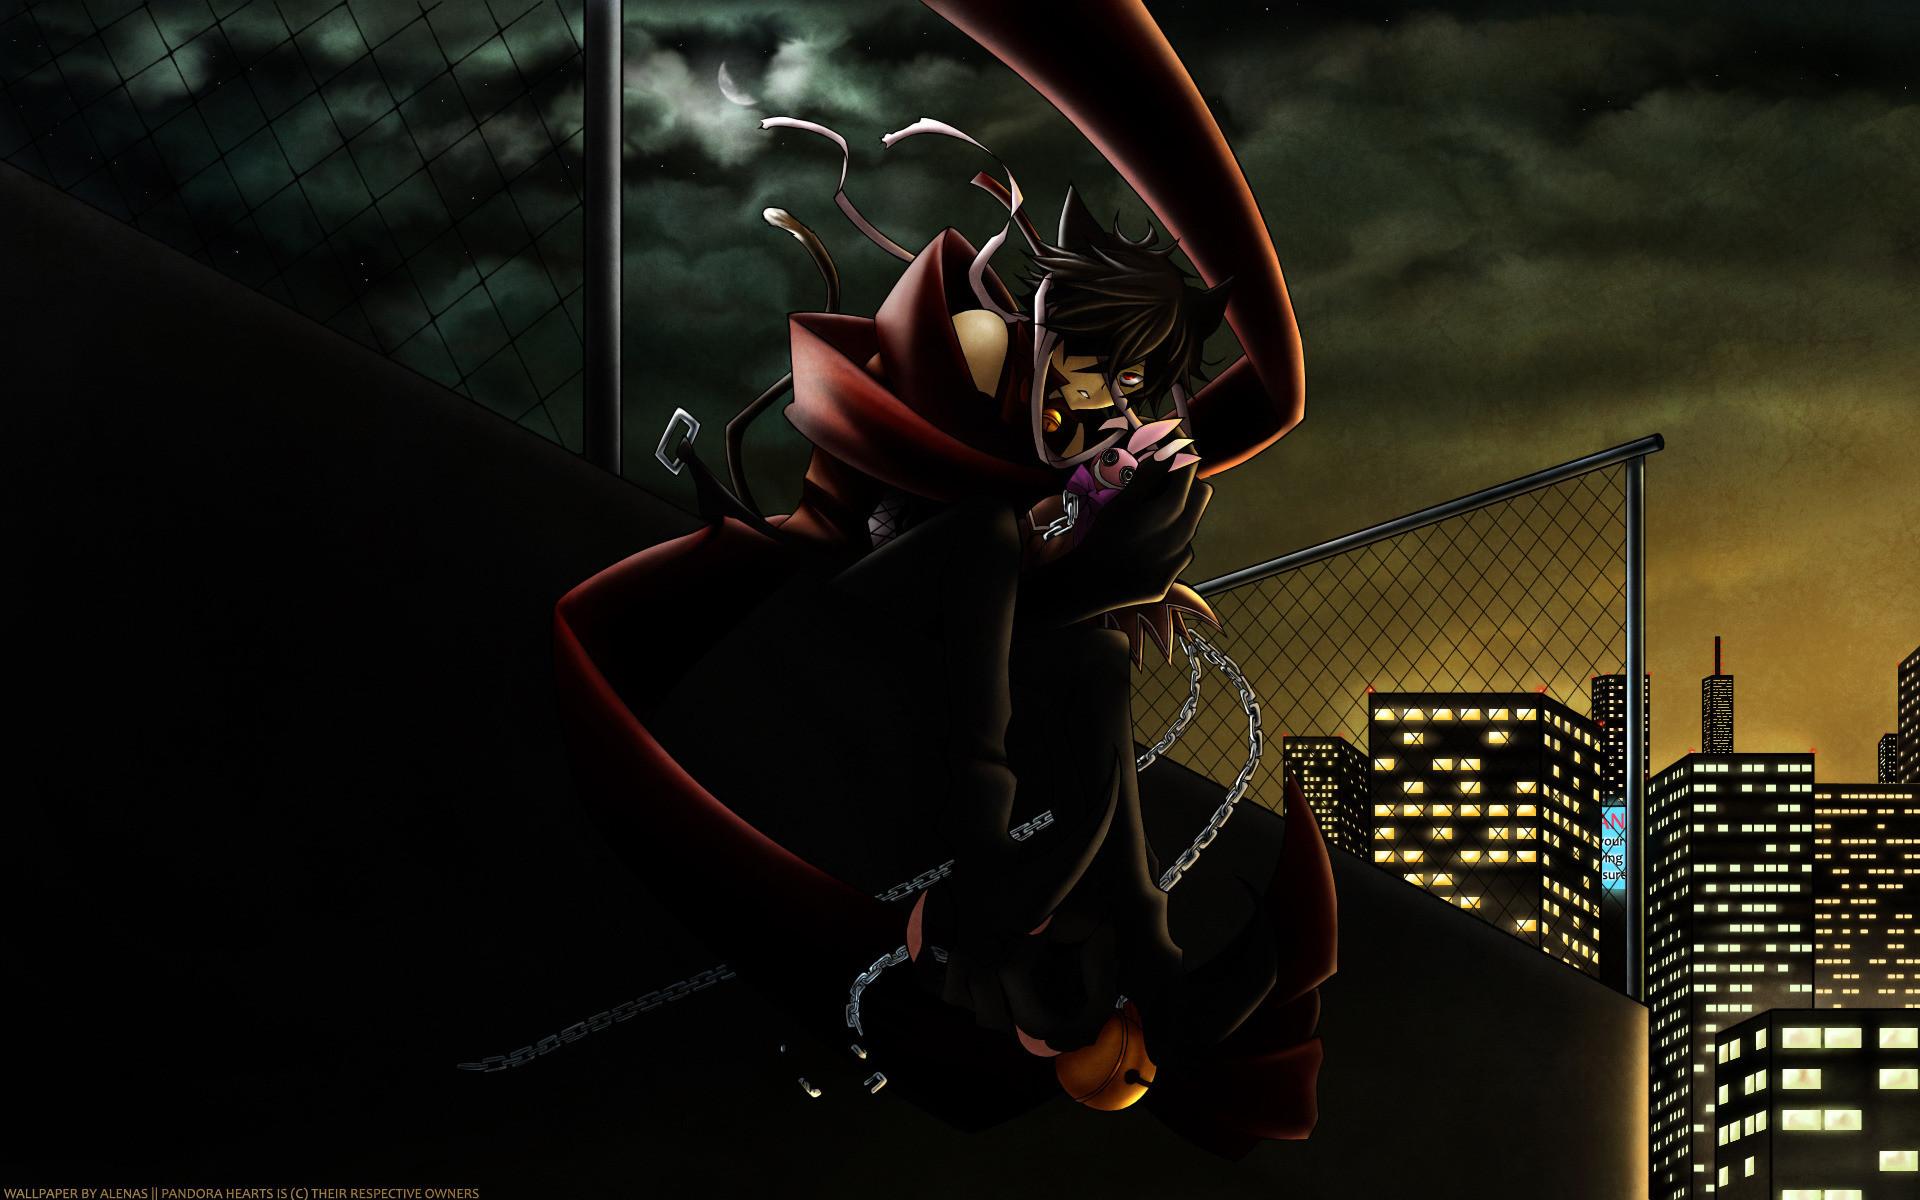 Anime warrior in dark city